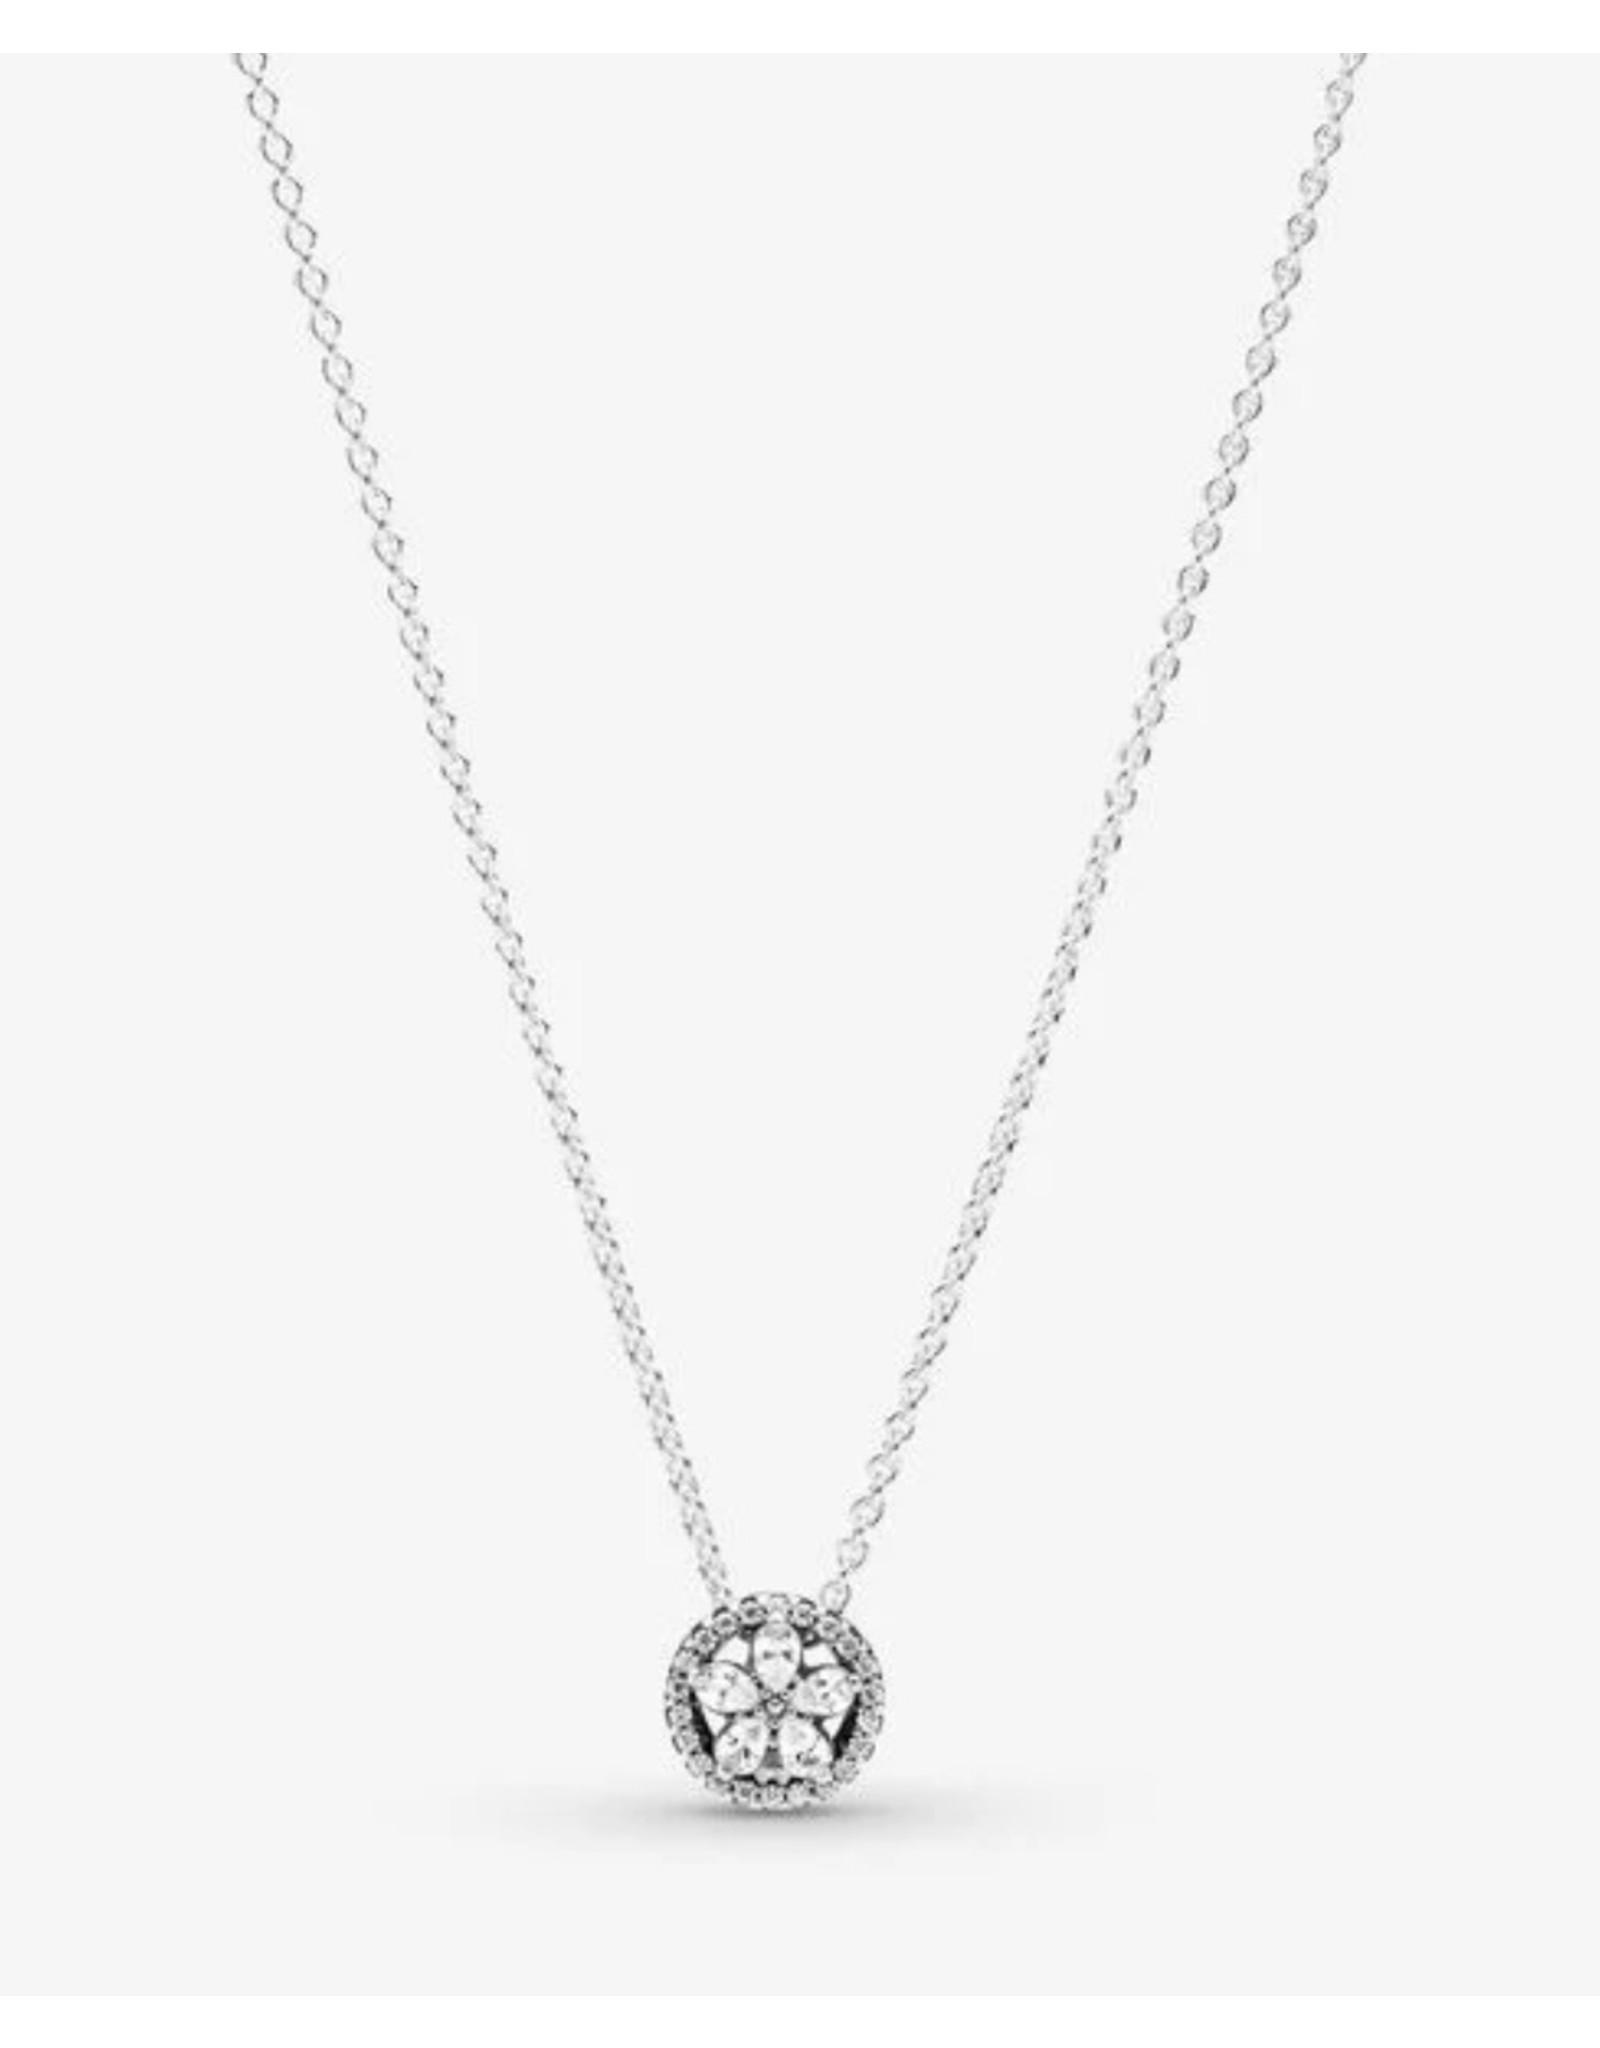 Pandora Necklace For Men : pandora, necklace, Pandora, Necklace,399230C01-45,, Sparkling, Snowflake,, Clear, Monde